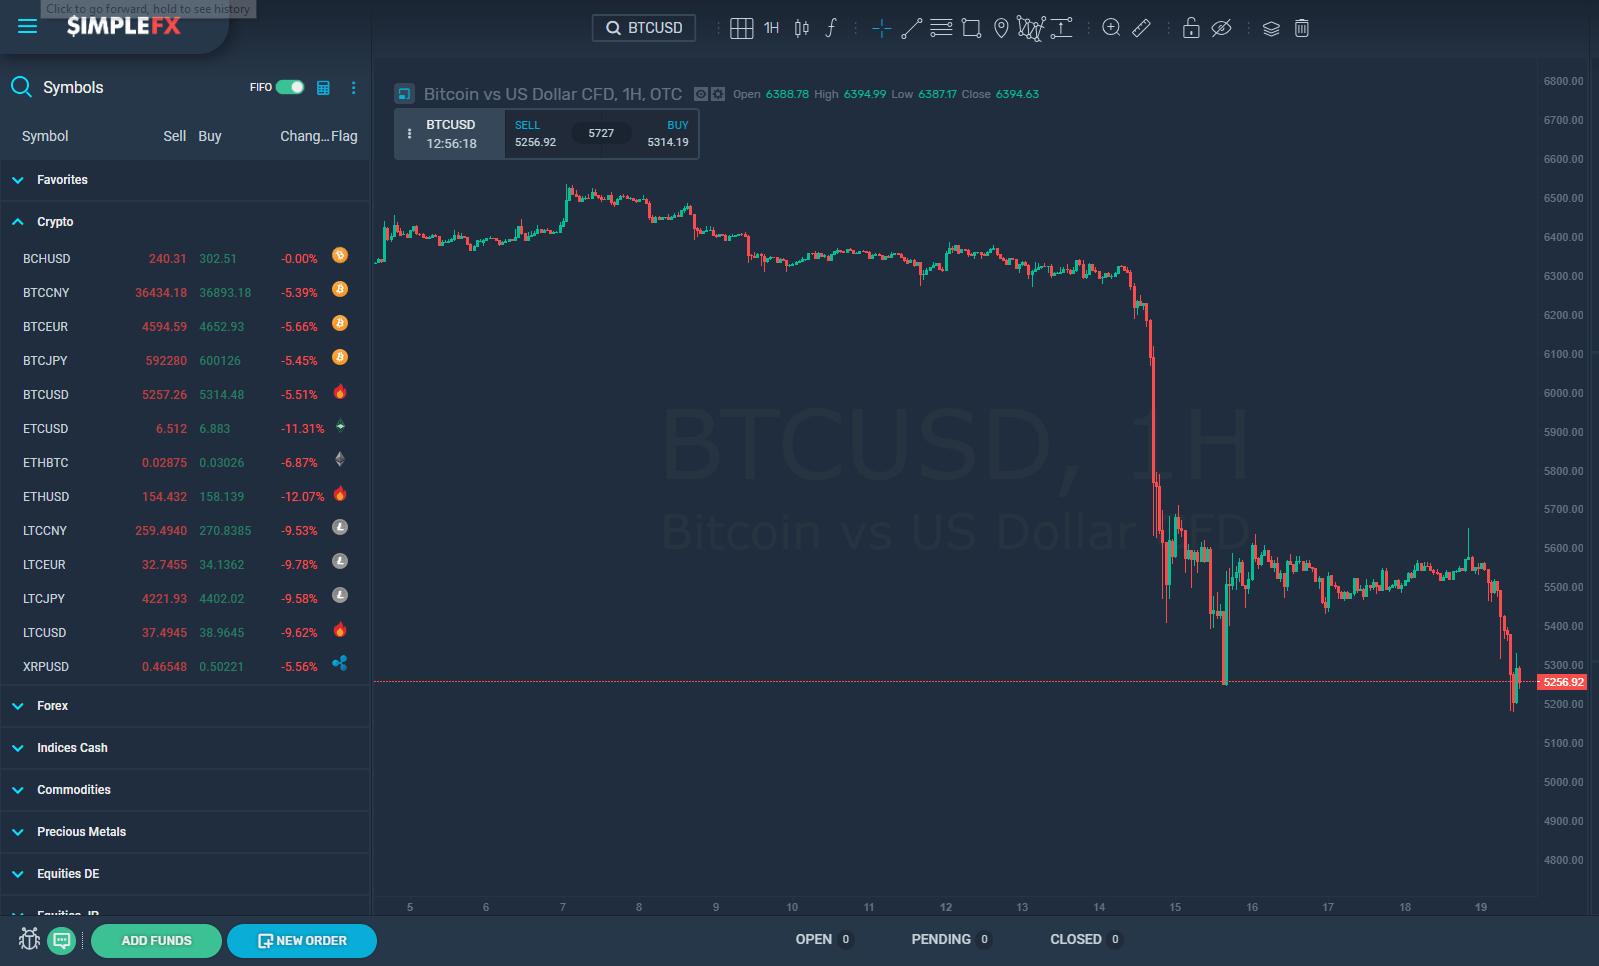 SimpleFX, Bitcoin, Blockchain, Market, Cryptocurrency